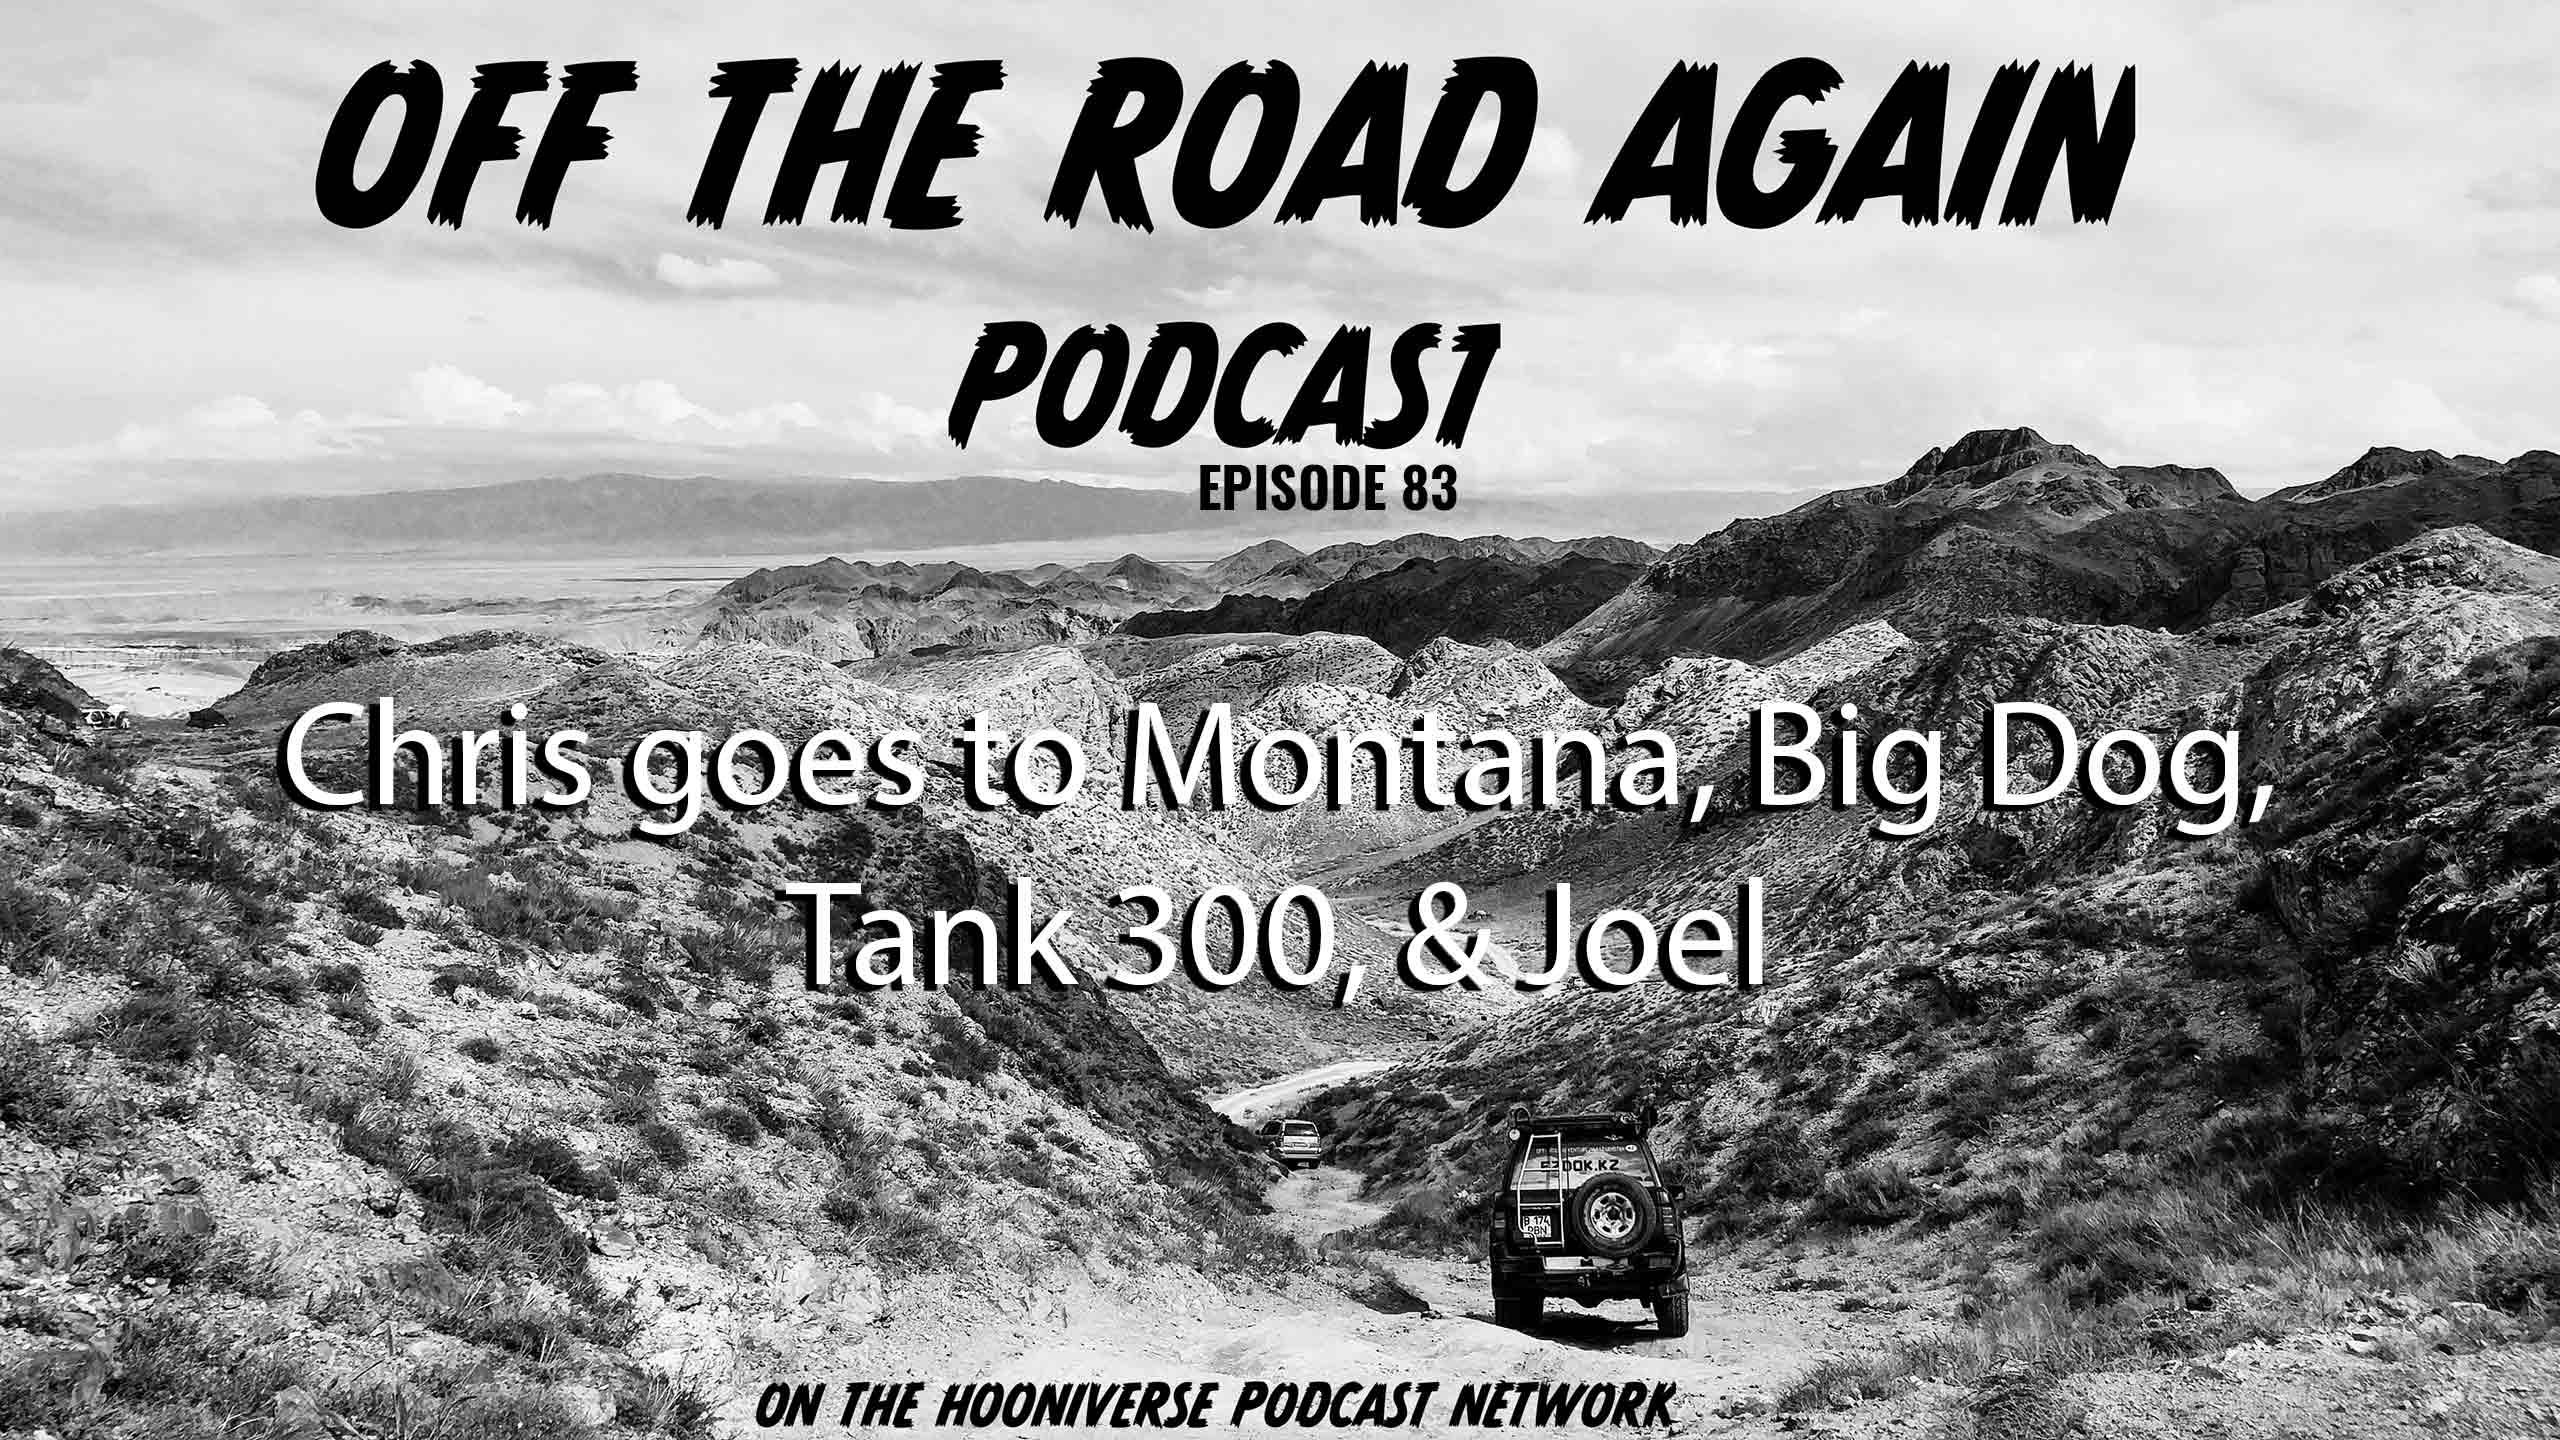 Montana-Big-Dog-Tank-Joel-Strickland-Off-The-Road-Again-Podcast-Episode-83